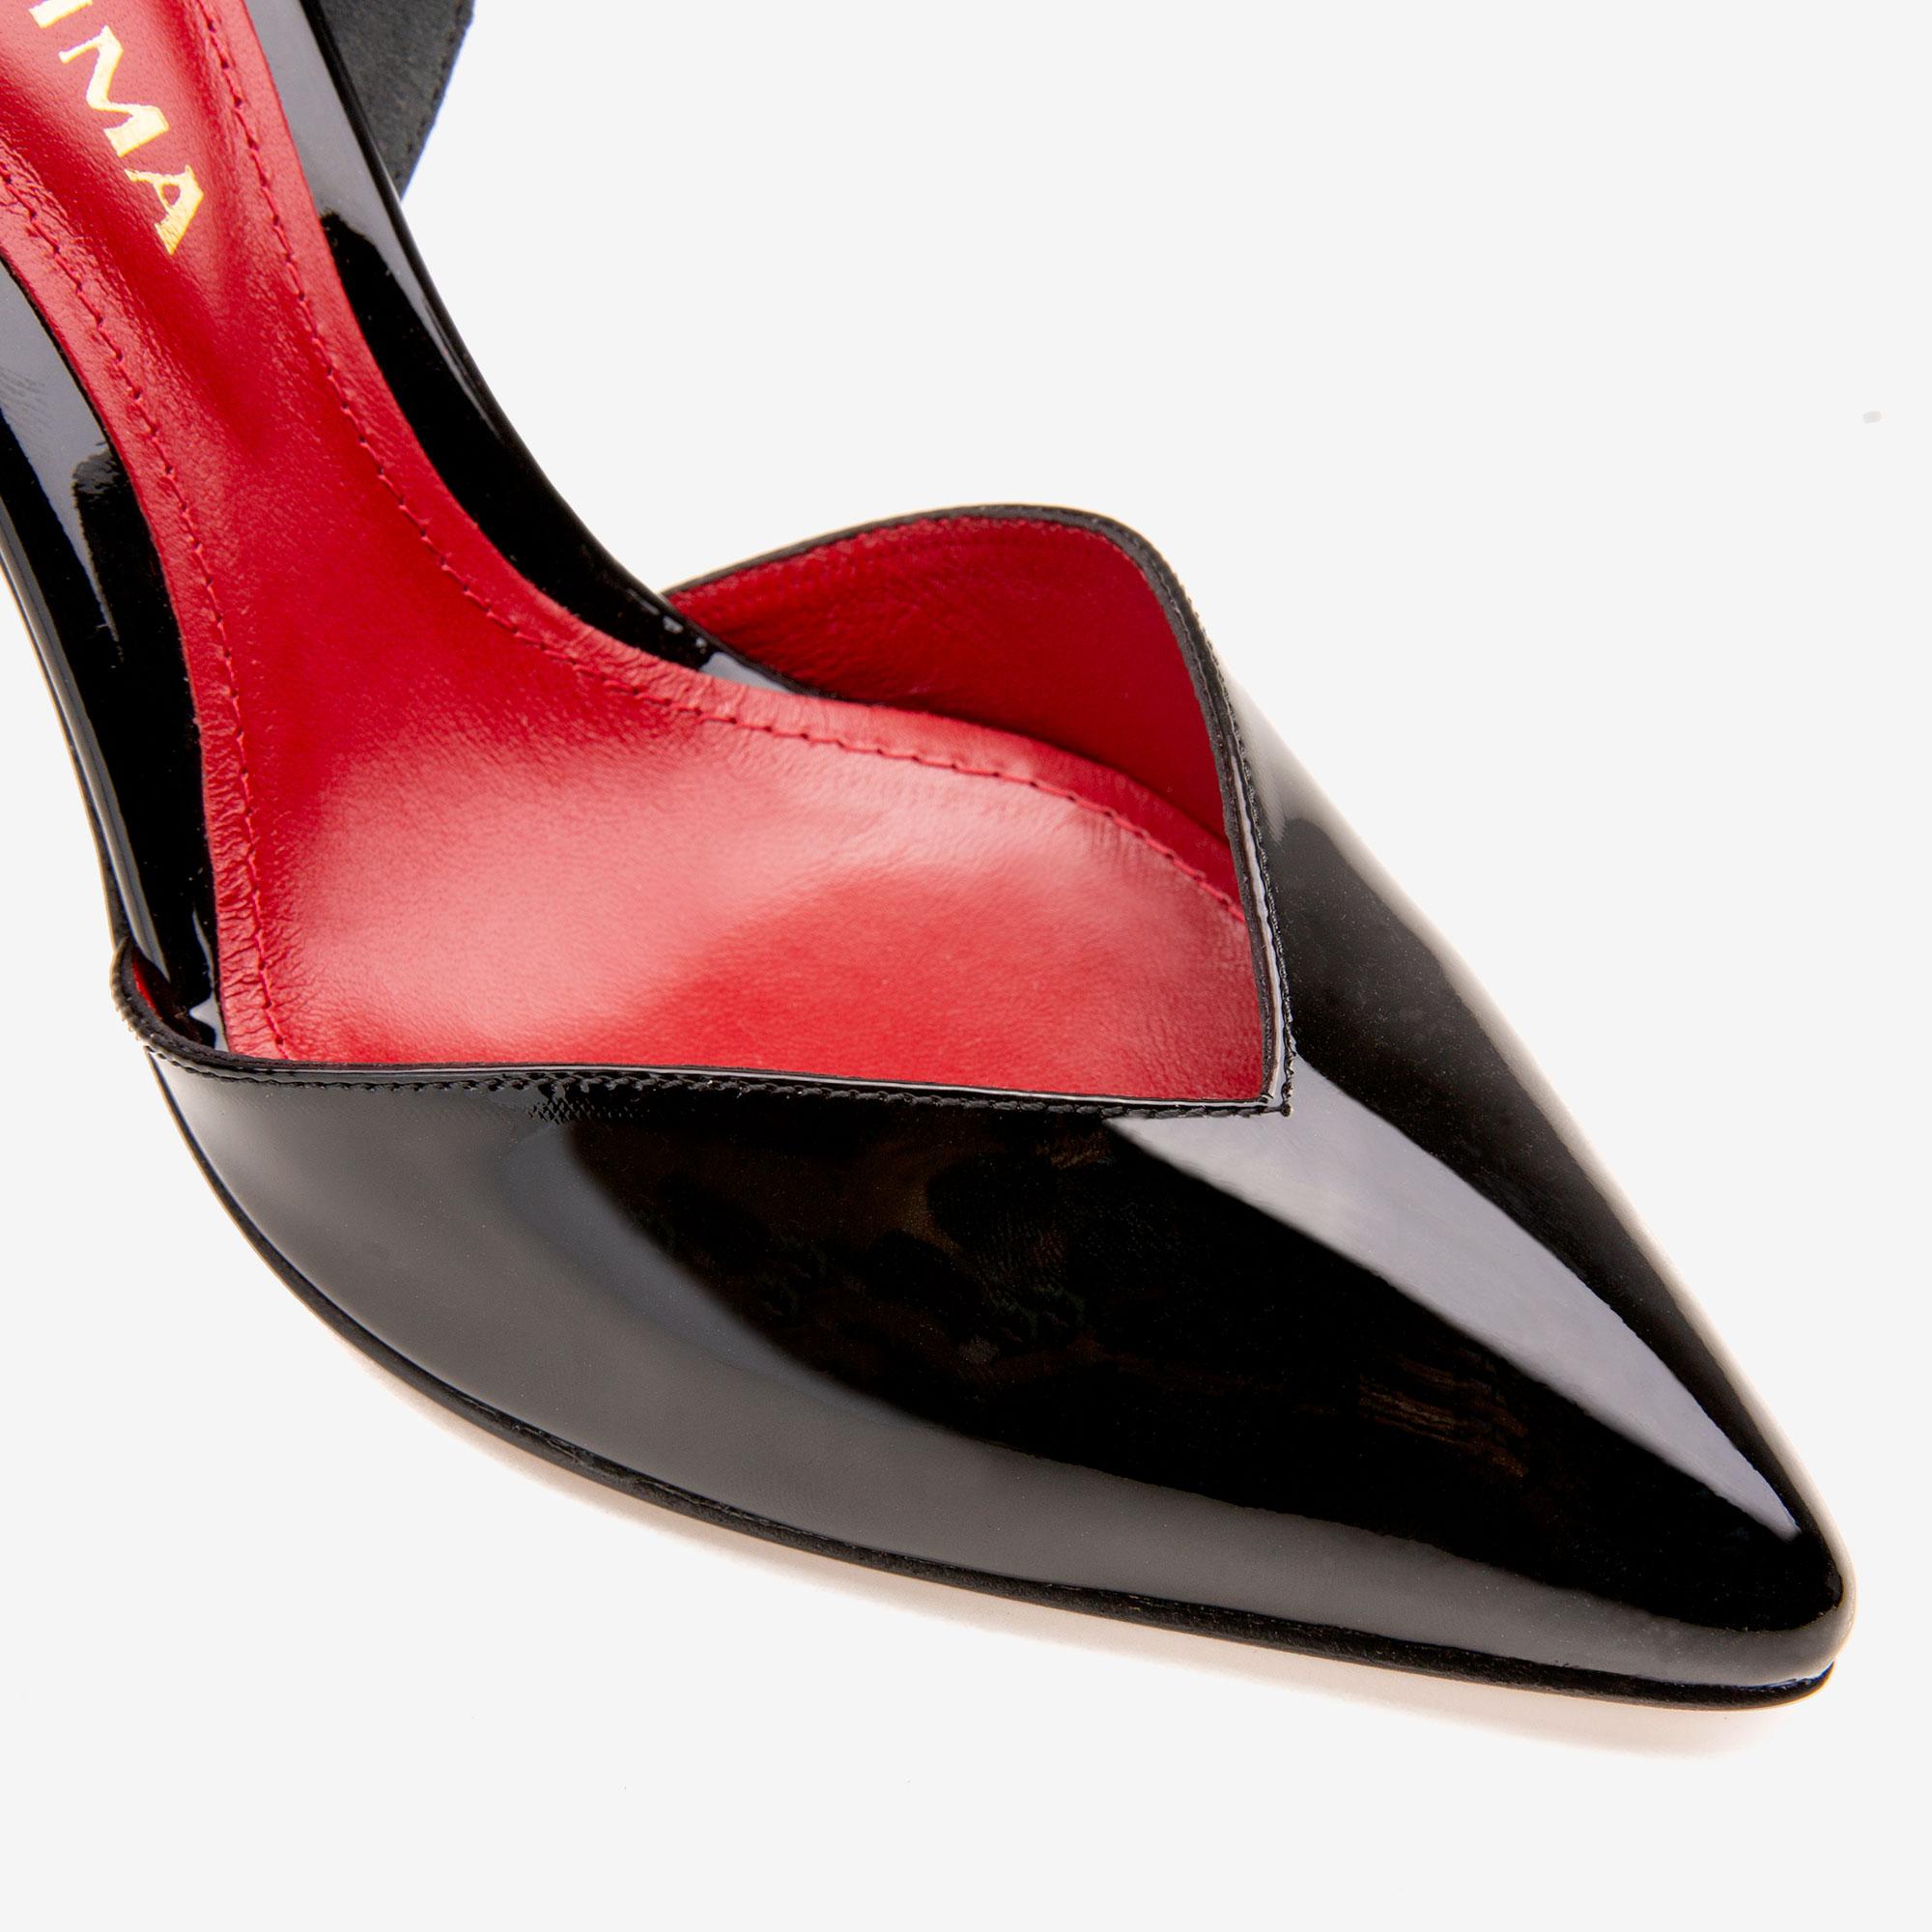 Pantofi din piele lacuita neagra cu varf ascutit Ginissima imagine 4